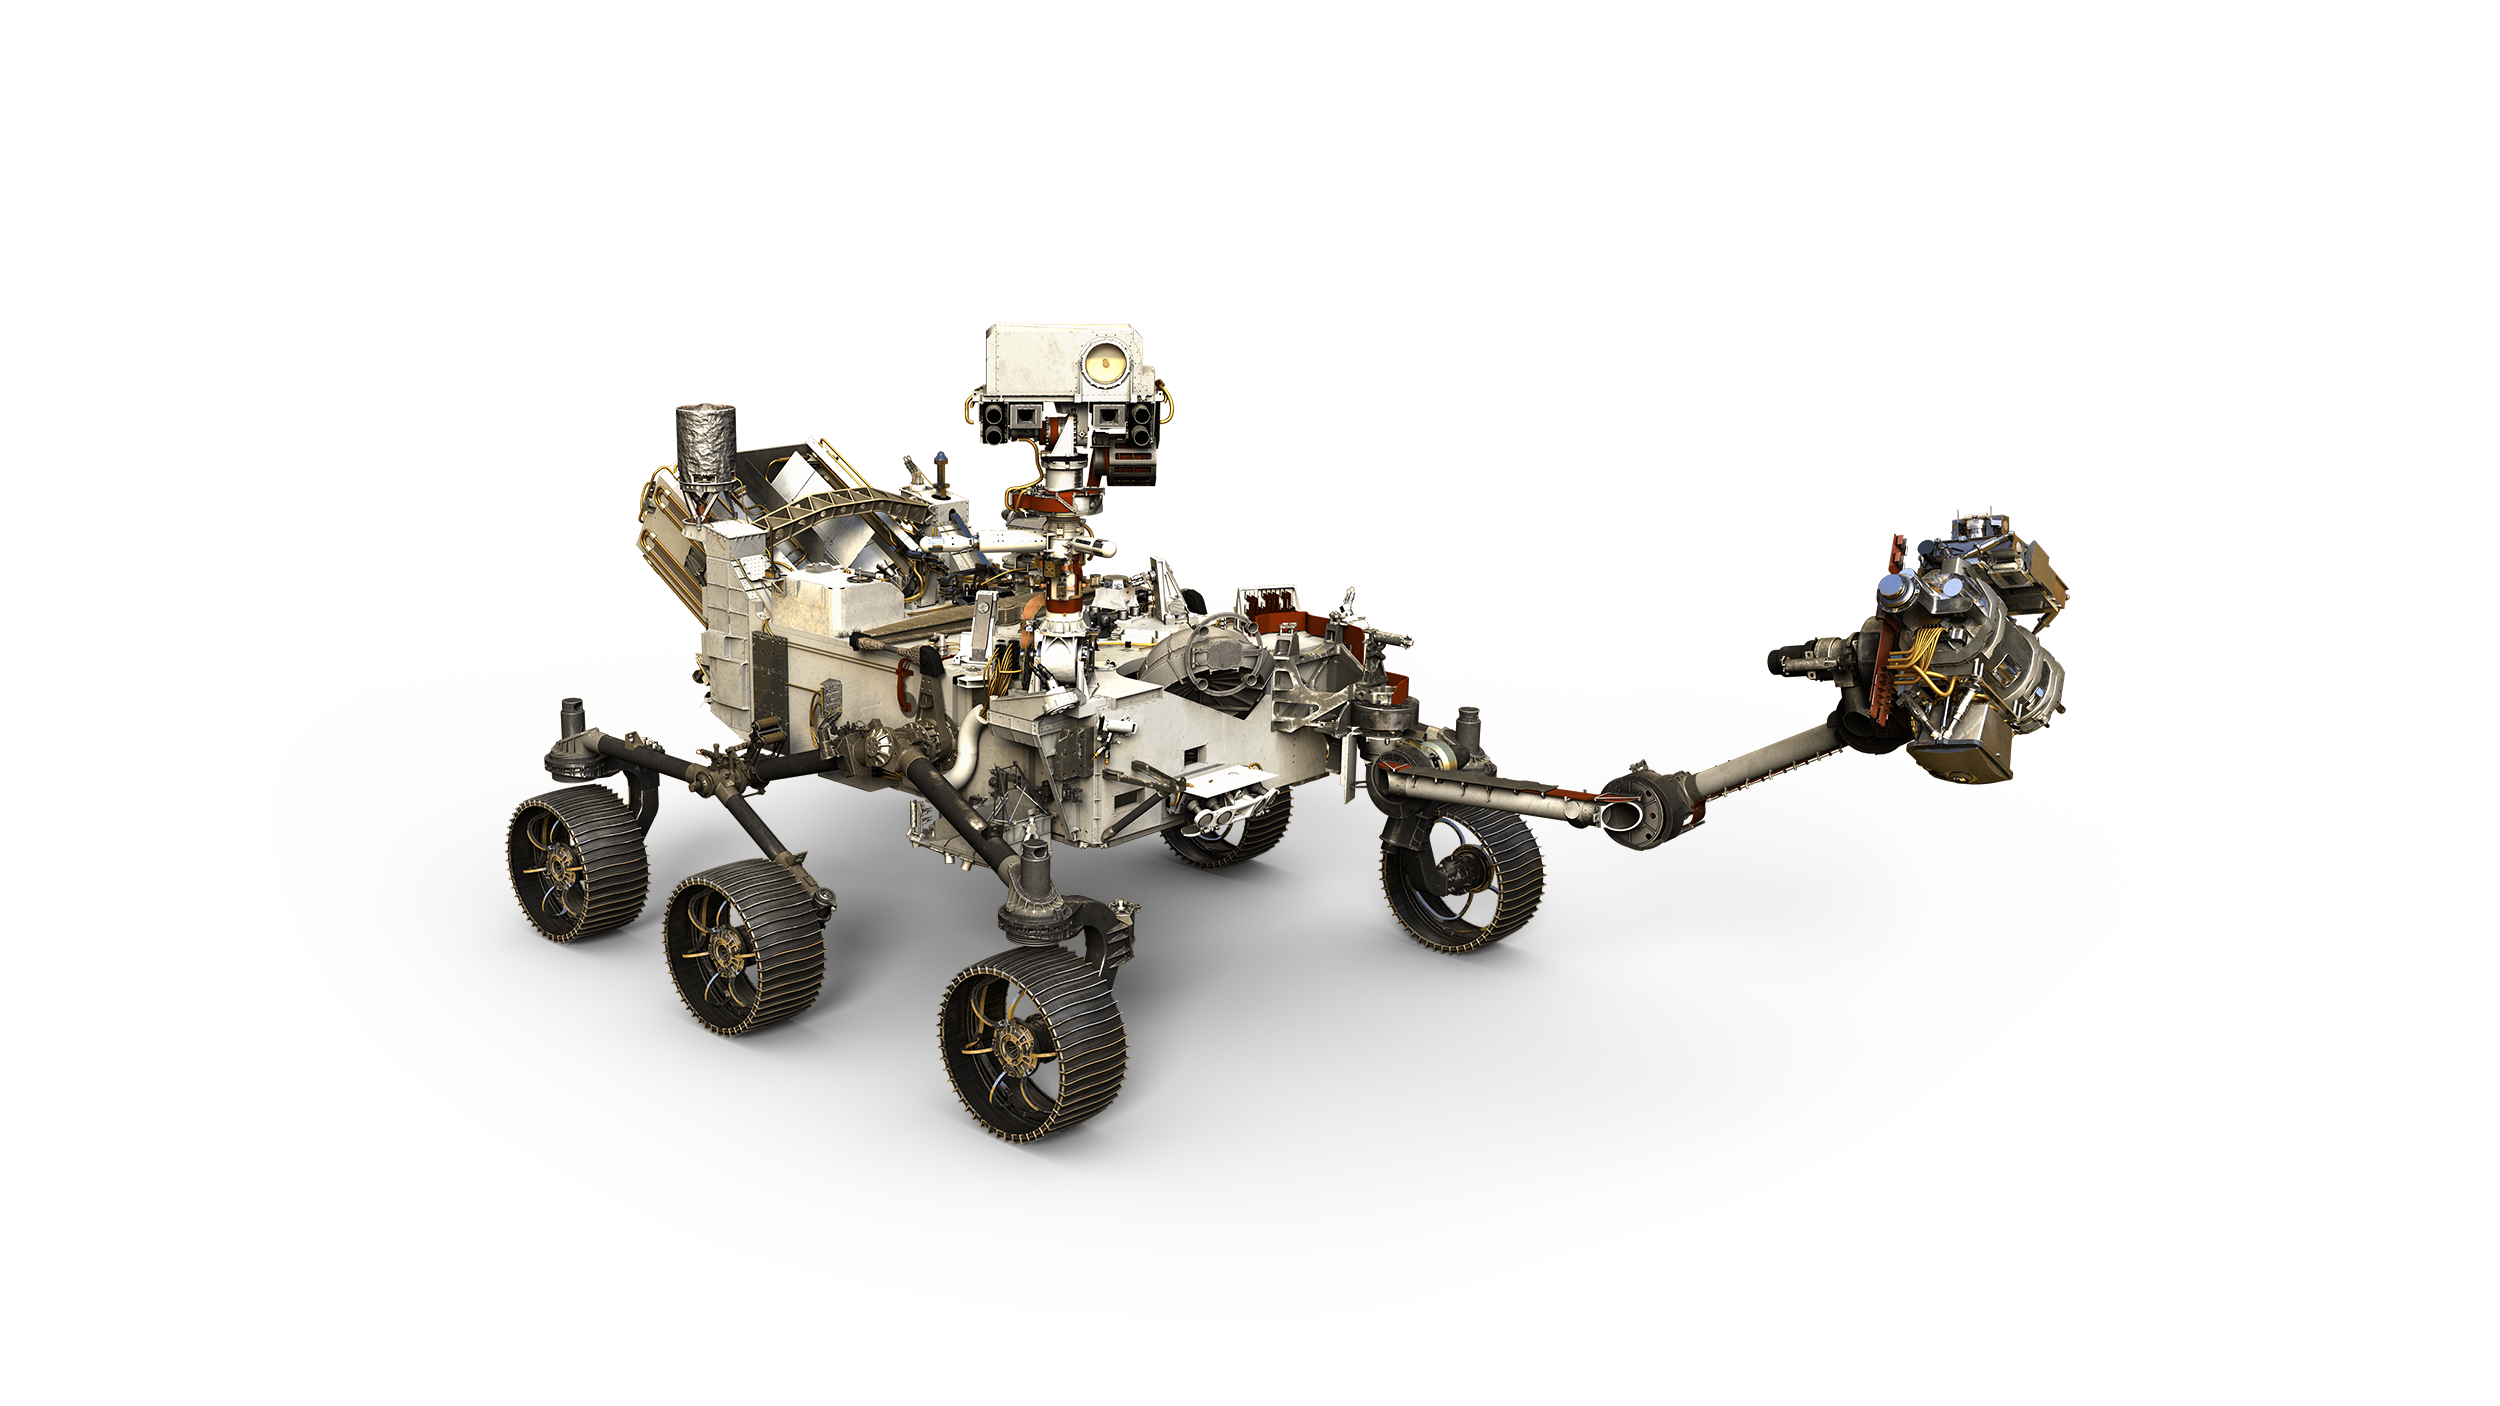 Perseverance (Mars 2020 rover). Fonte: NASA